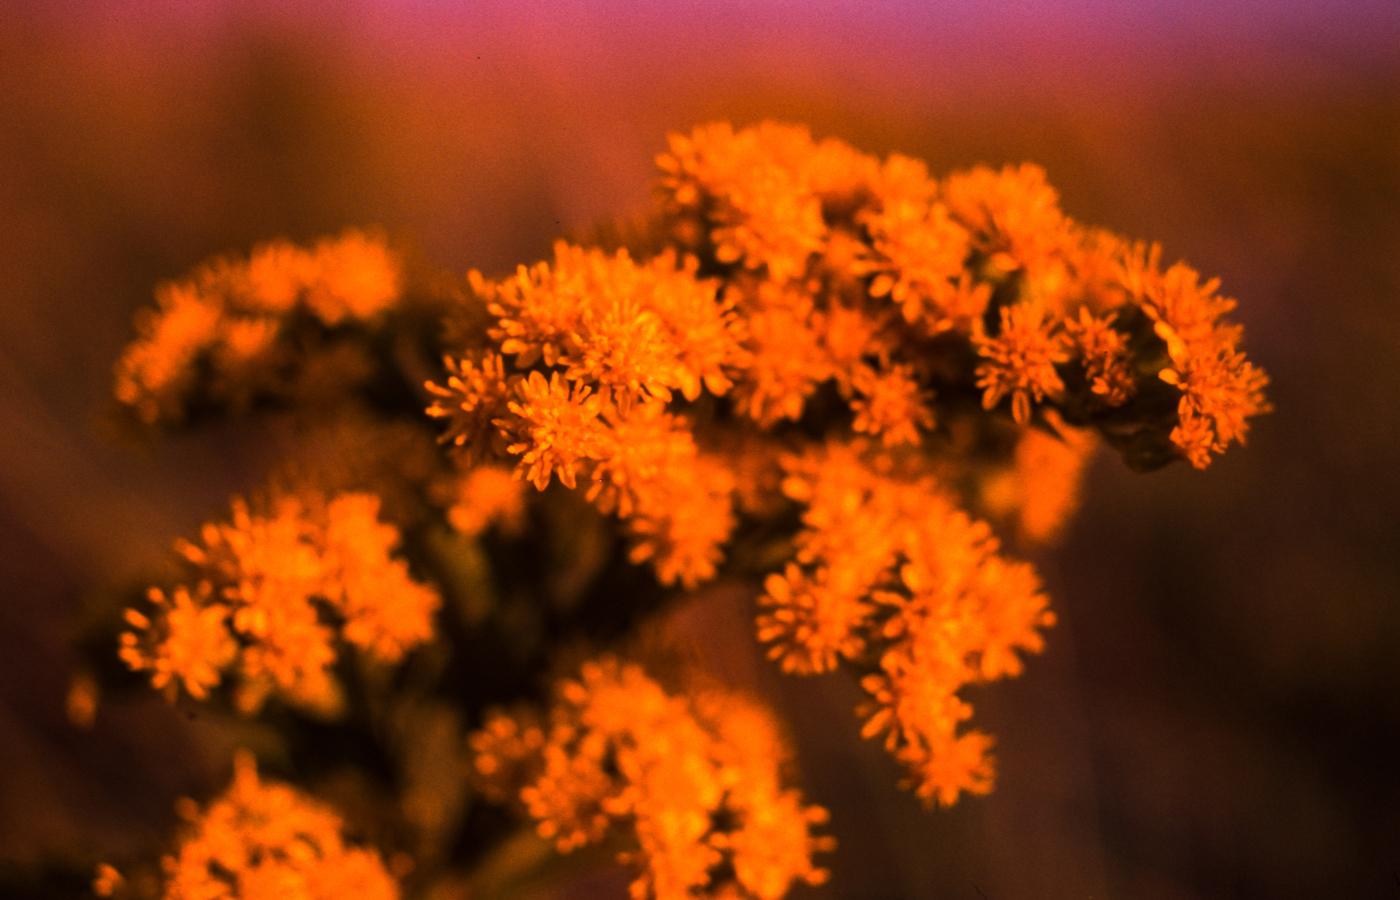 kodachrome-flowers-4k-6s.jpg